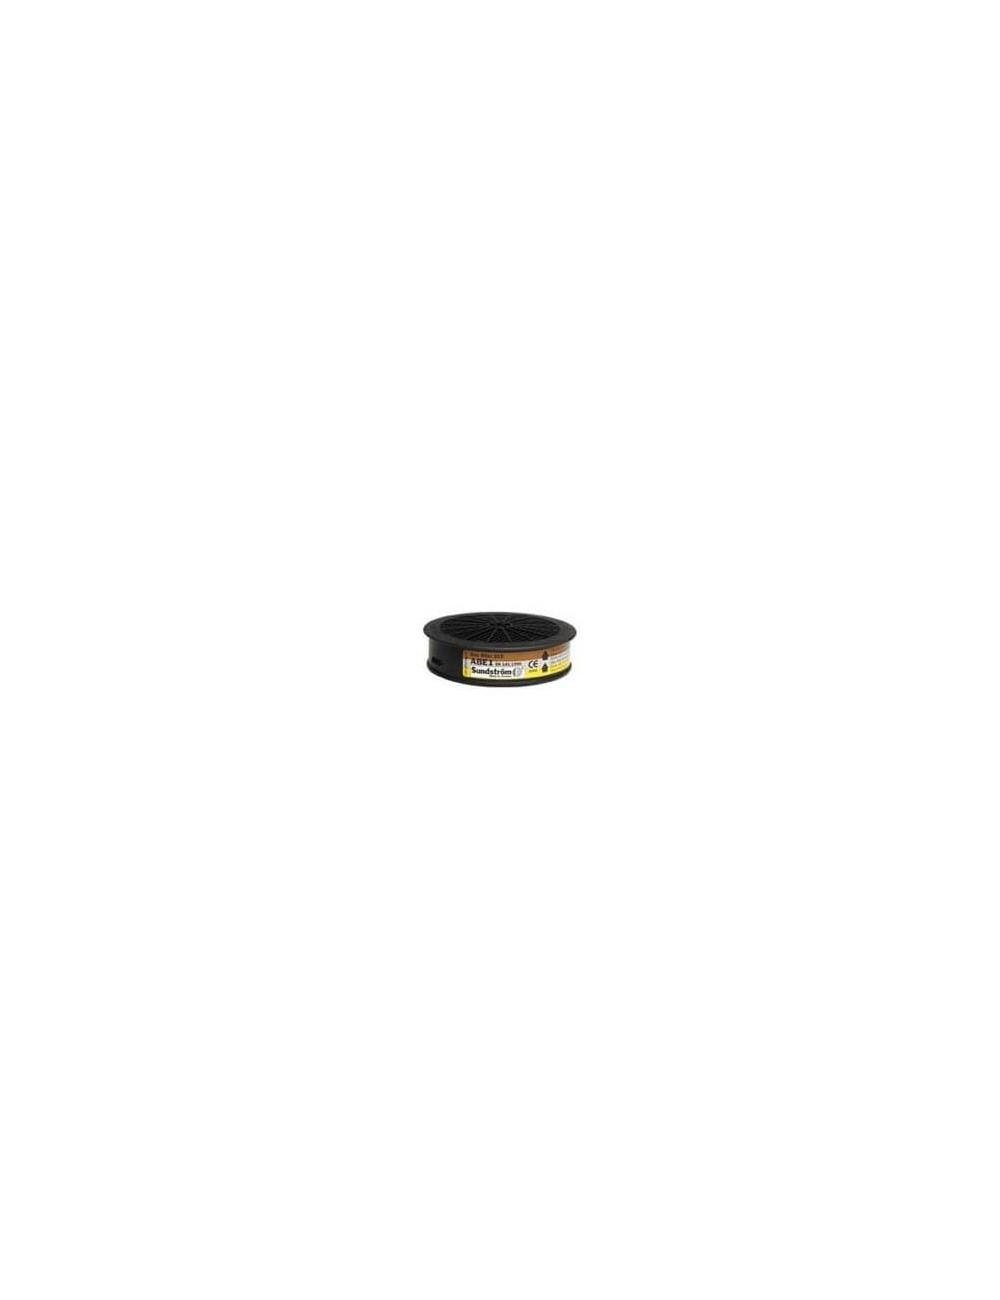 Filtr Sr 315 ABE1 Sundstrom H02-3212